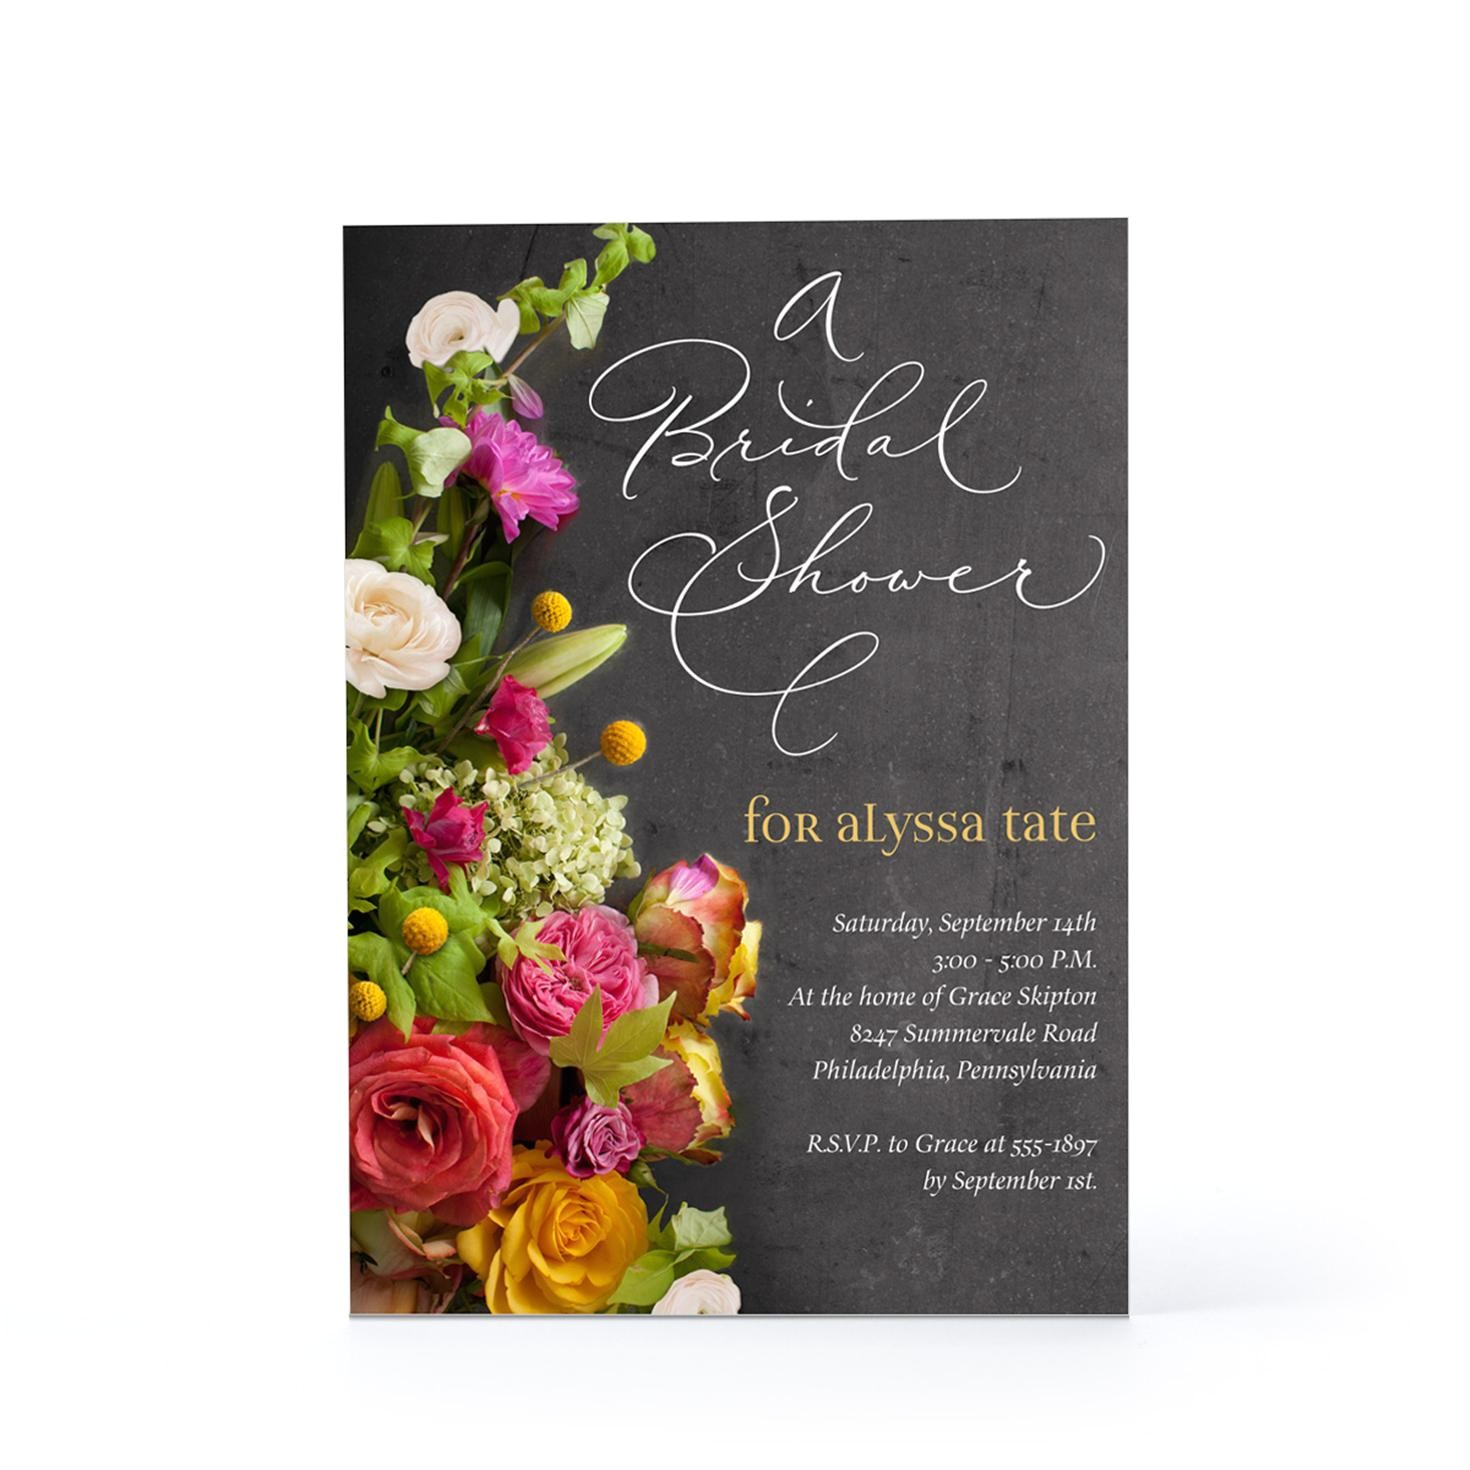 hallmark invitations